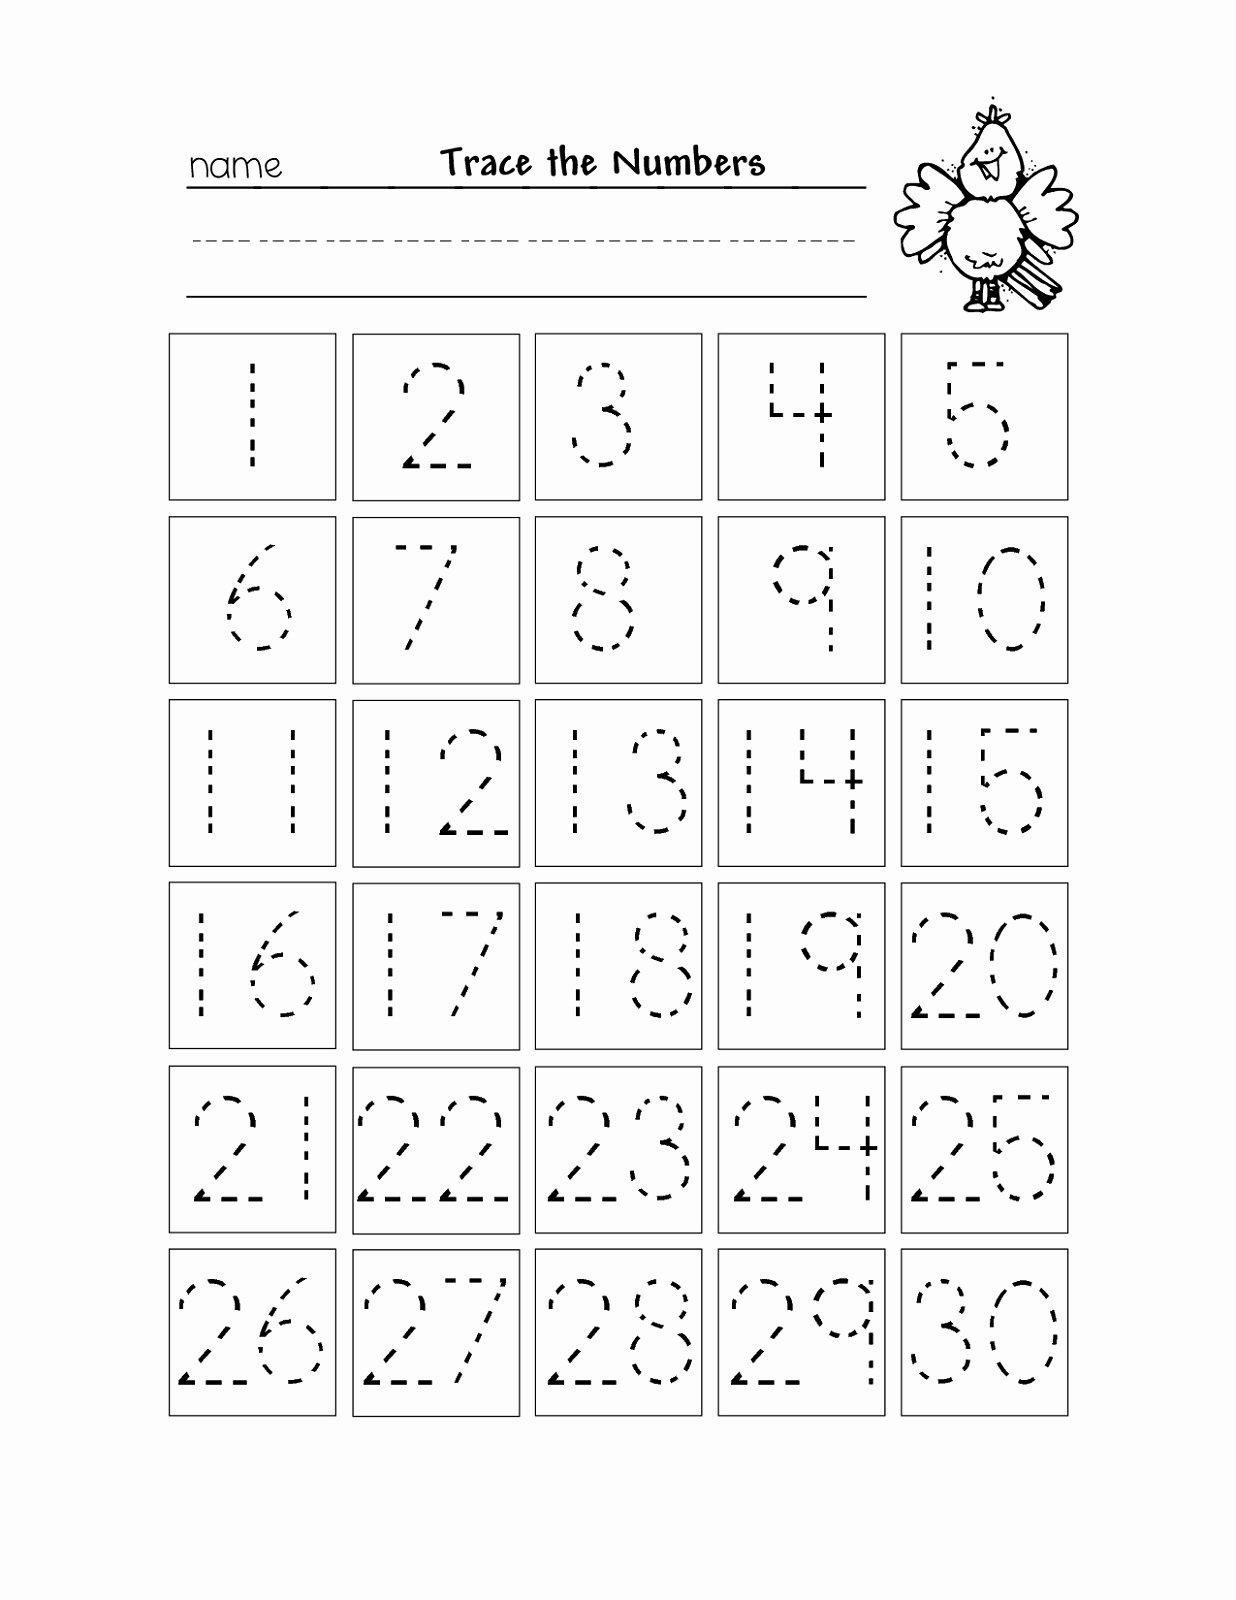 Free Printable Number Tracing Worksheets New Number Tracing 1 20 Worksheet Generator